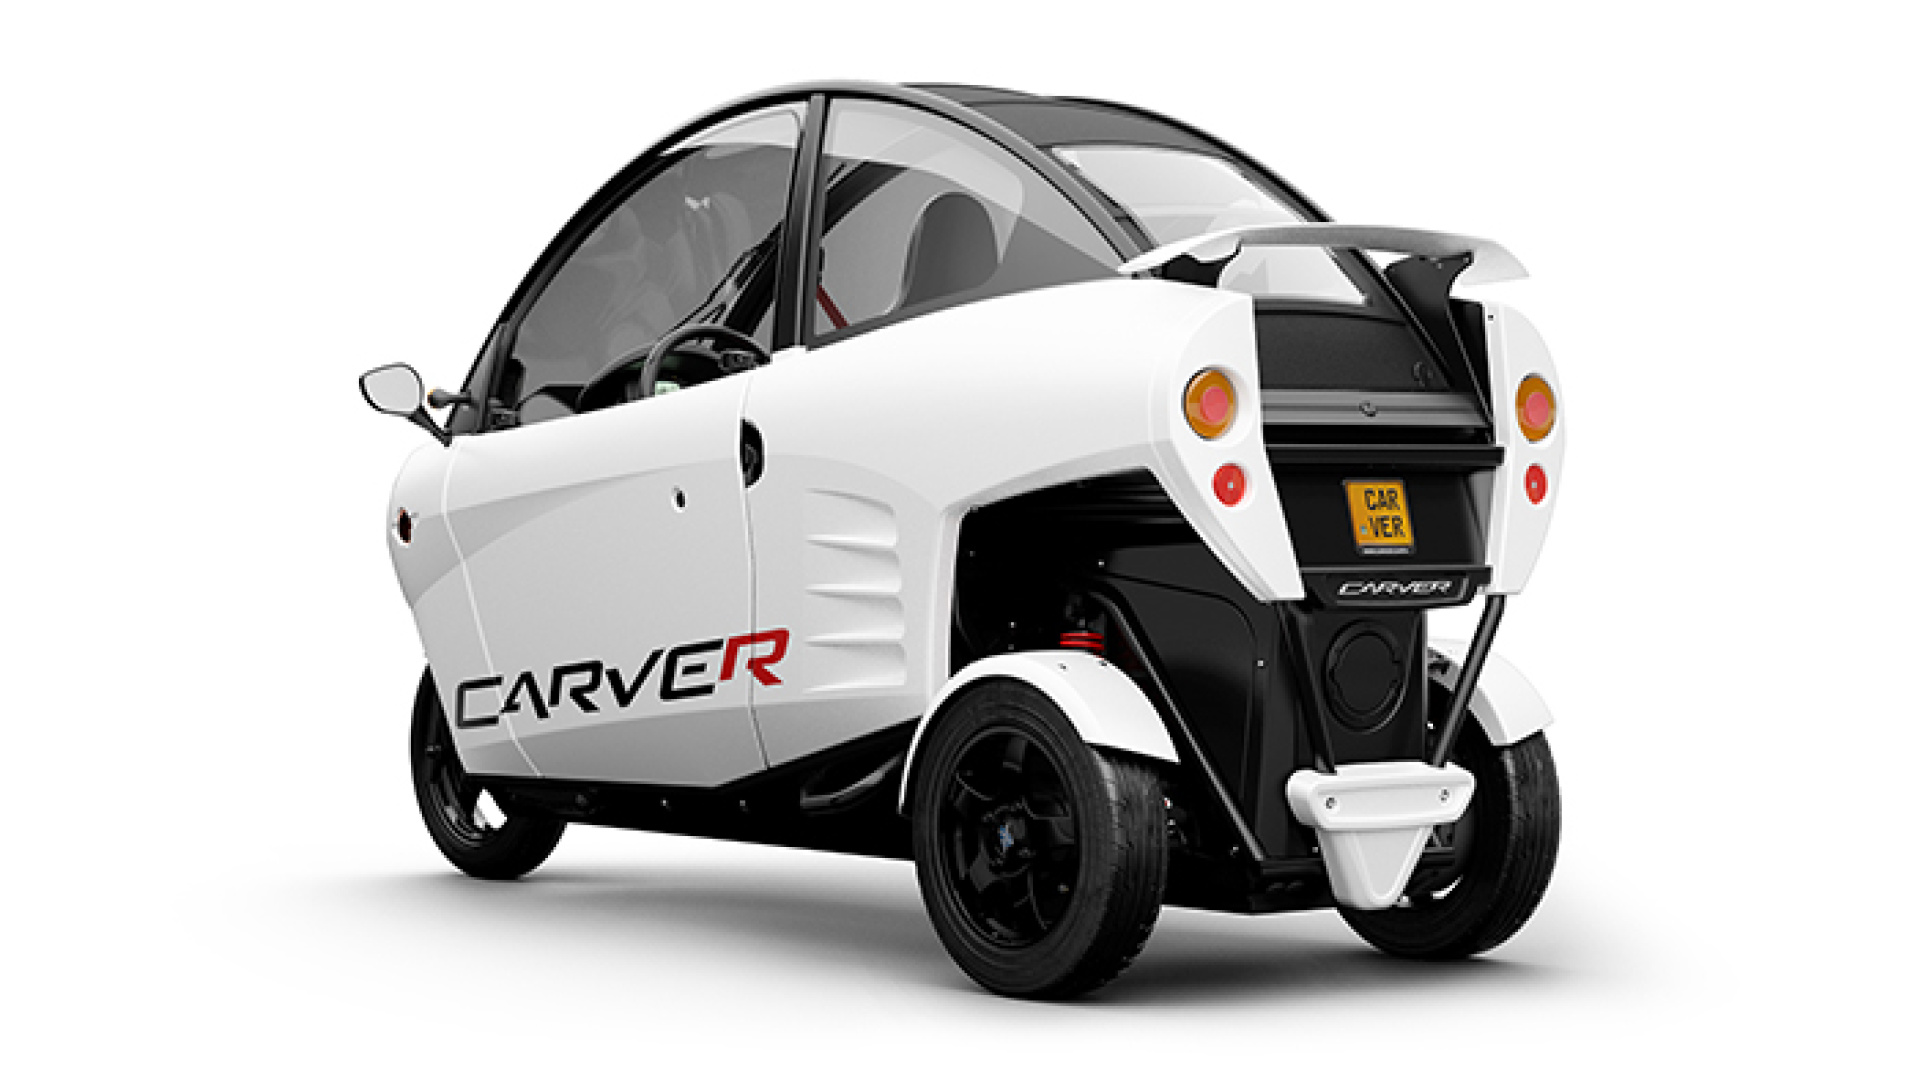 Carver-Carver Sport-4